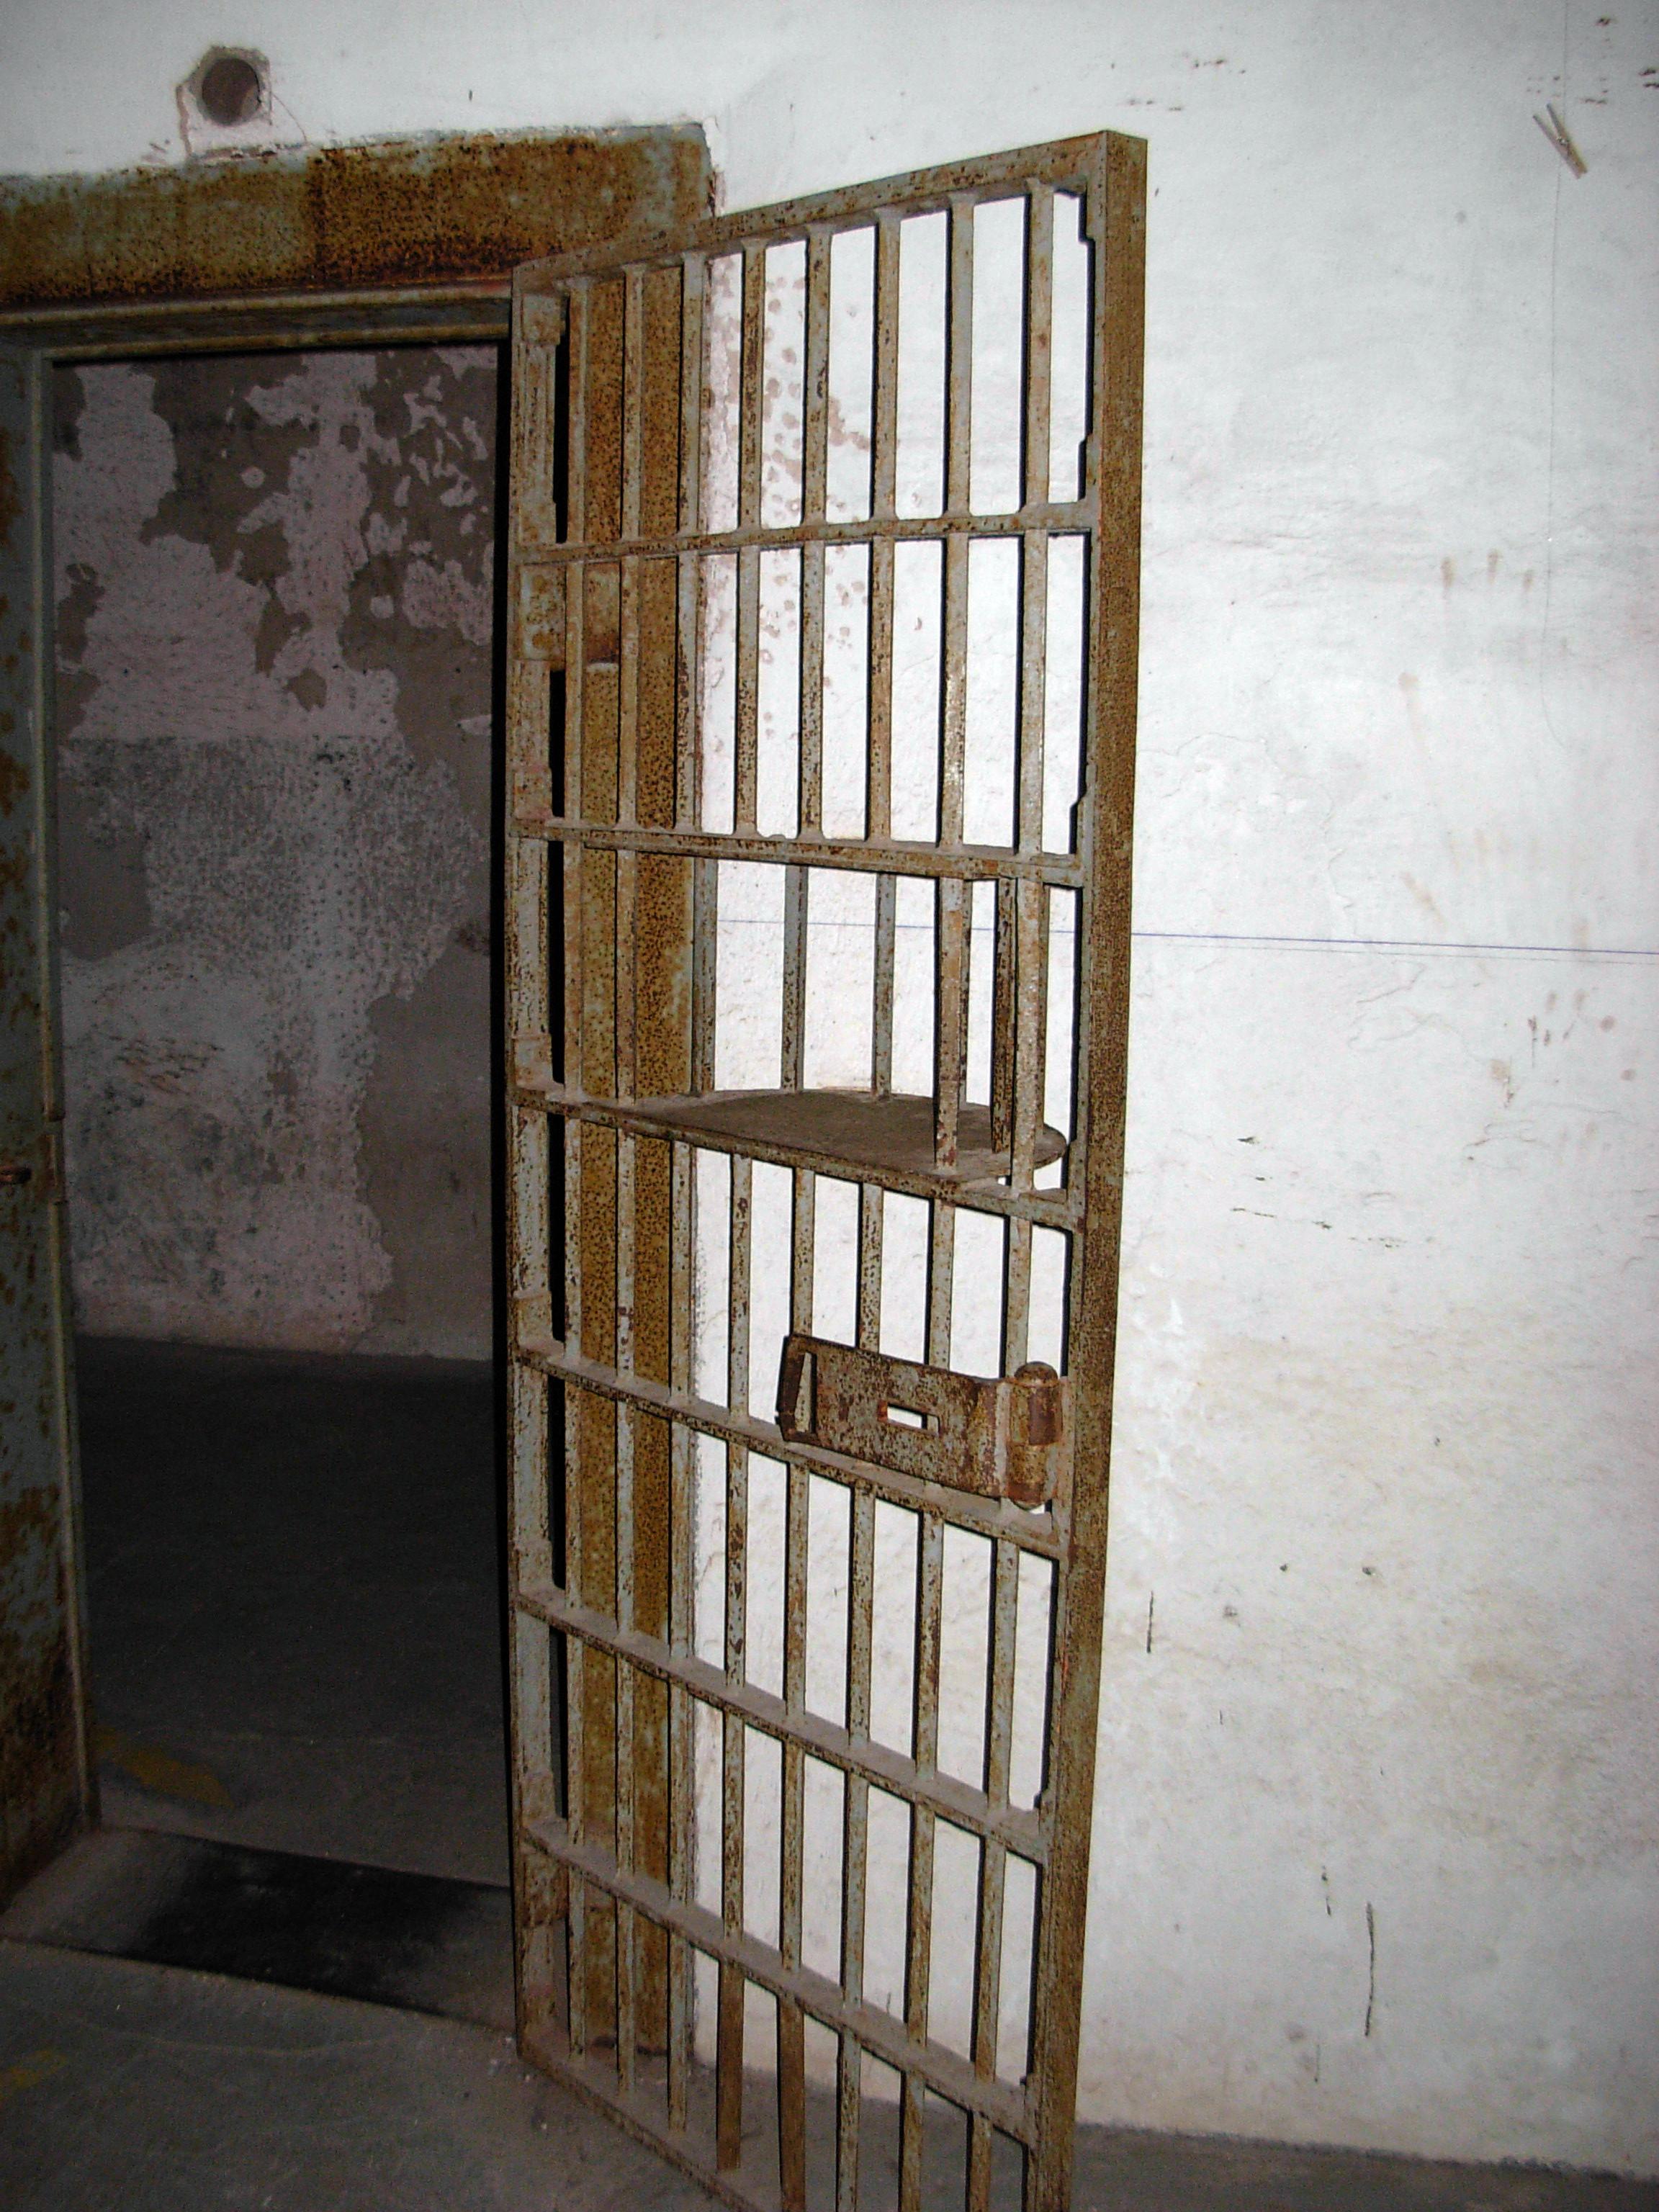 ghosts Old City Jail Charleston South Carolina haunted